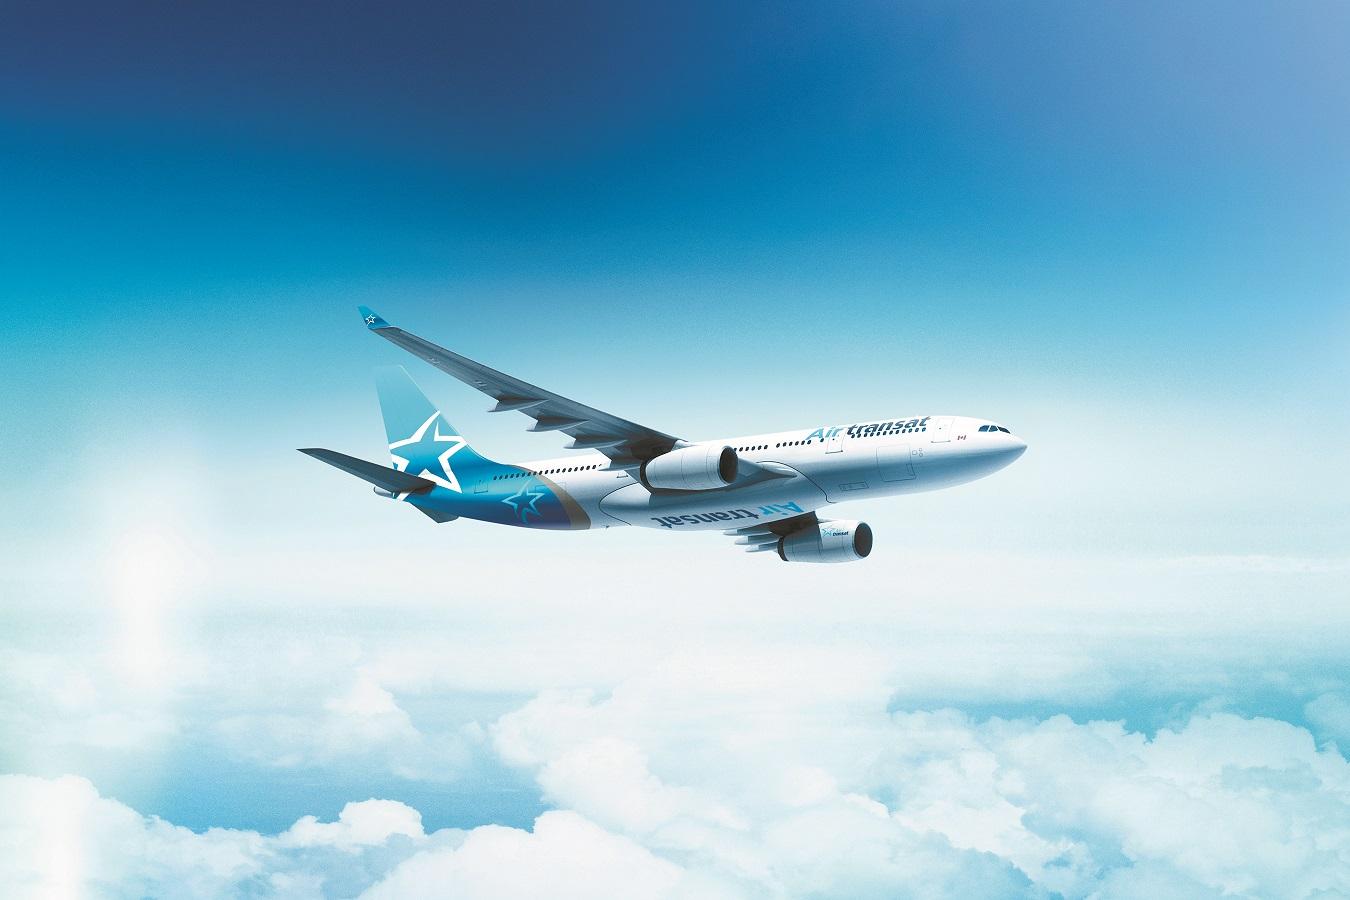 Air Transat a rehaussé son expérience à bord